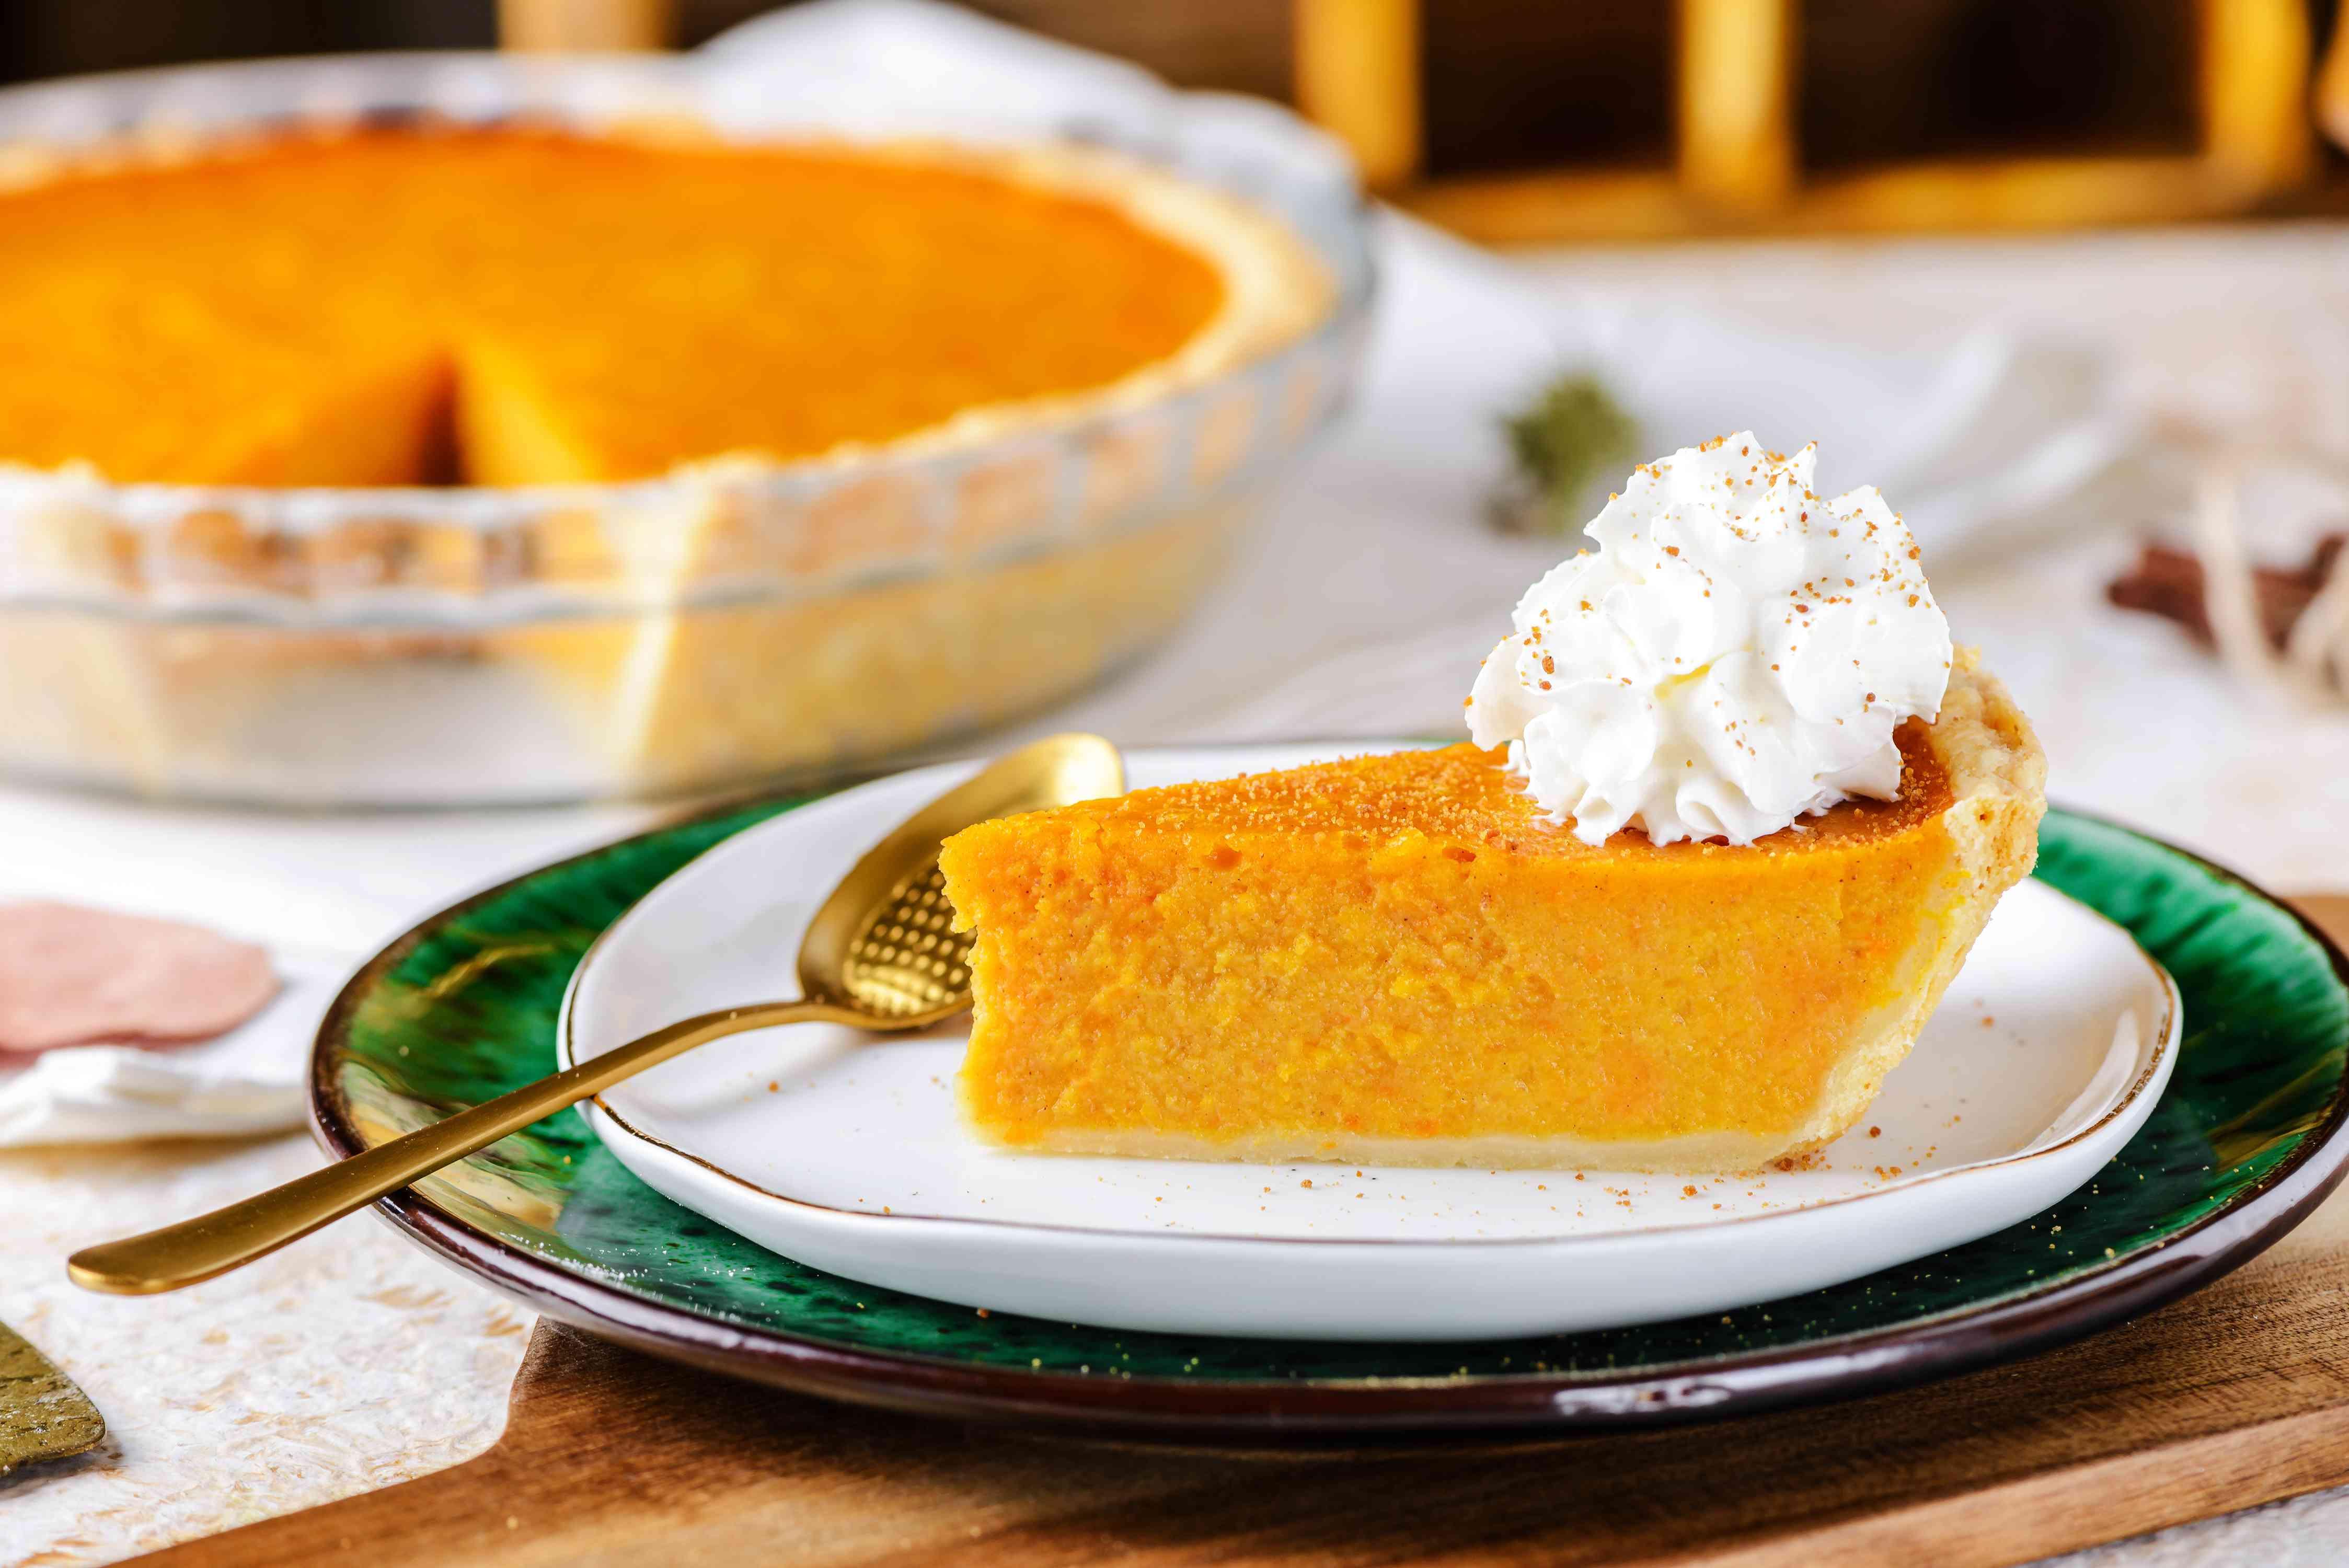 Autumn pumpkin pie recipe